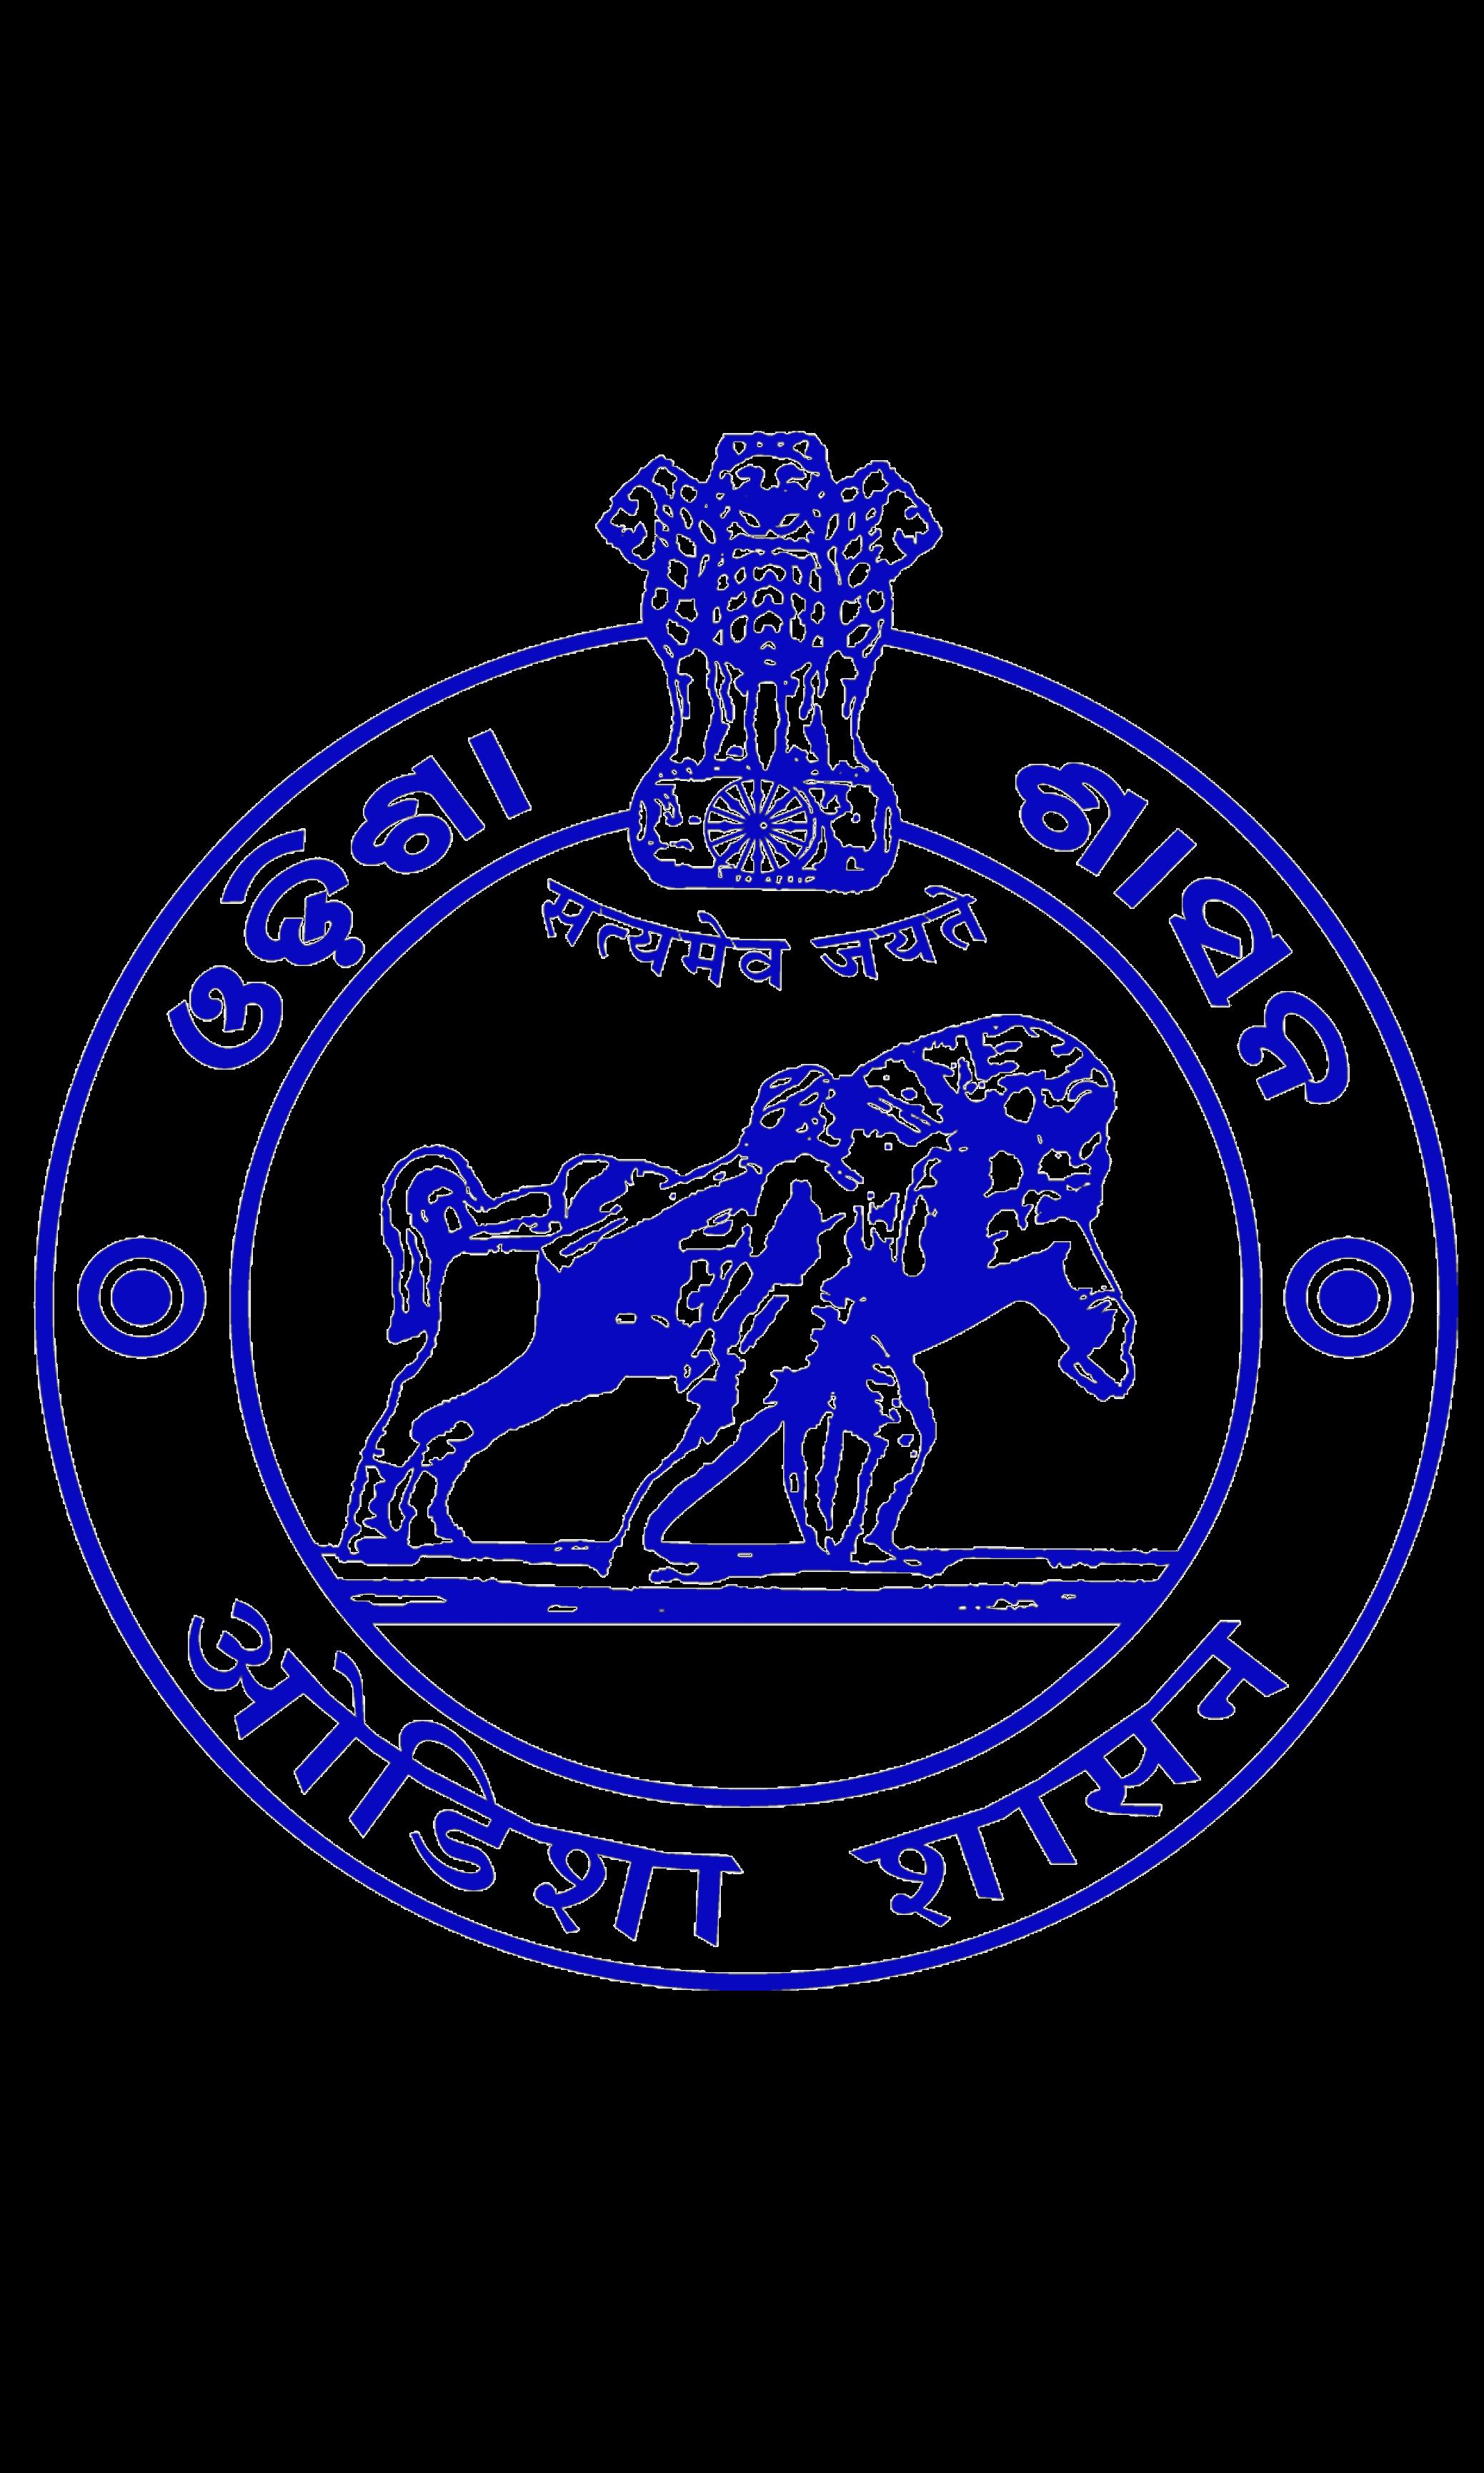 SSC Odisha